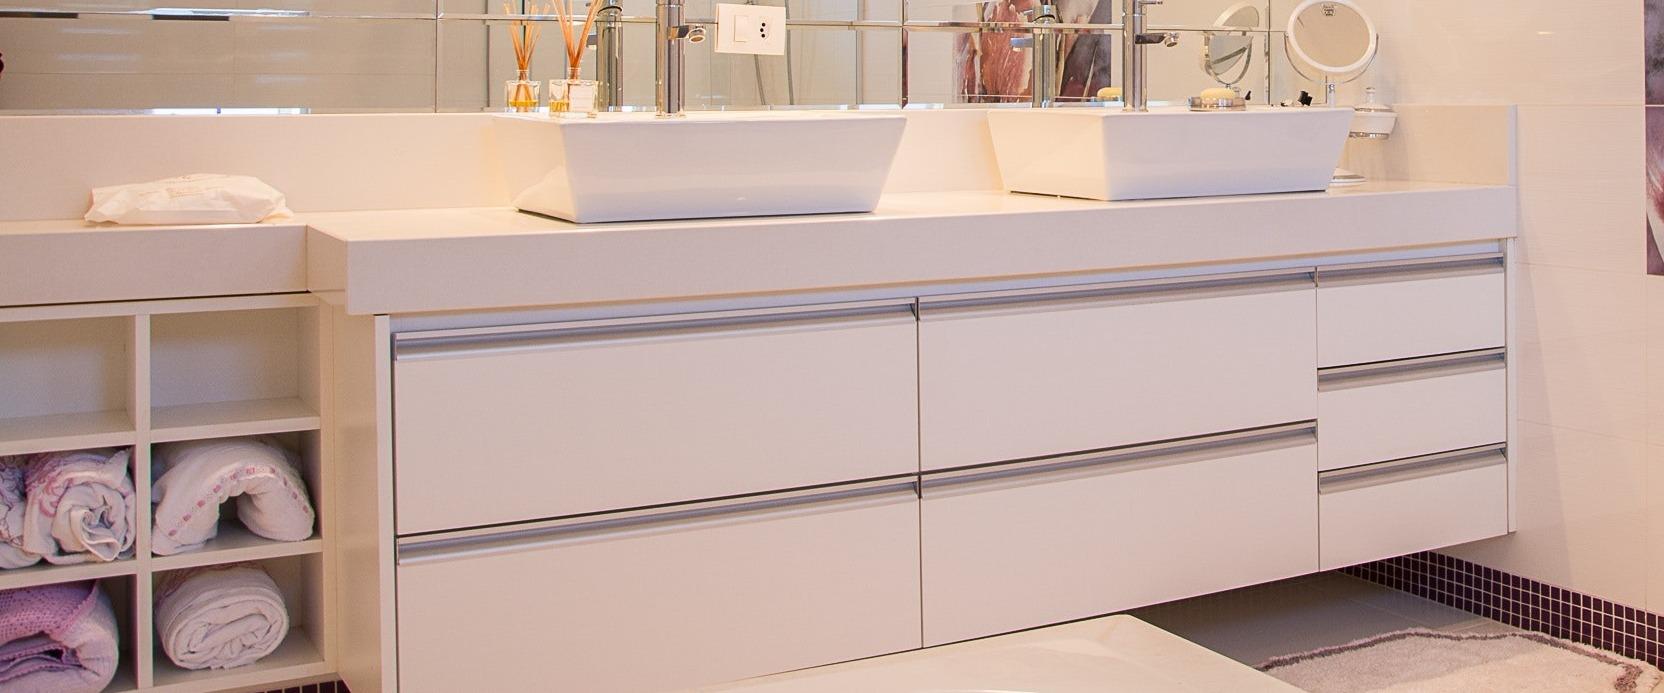 Granite Supplier Countertop Installation Cabinet